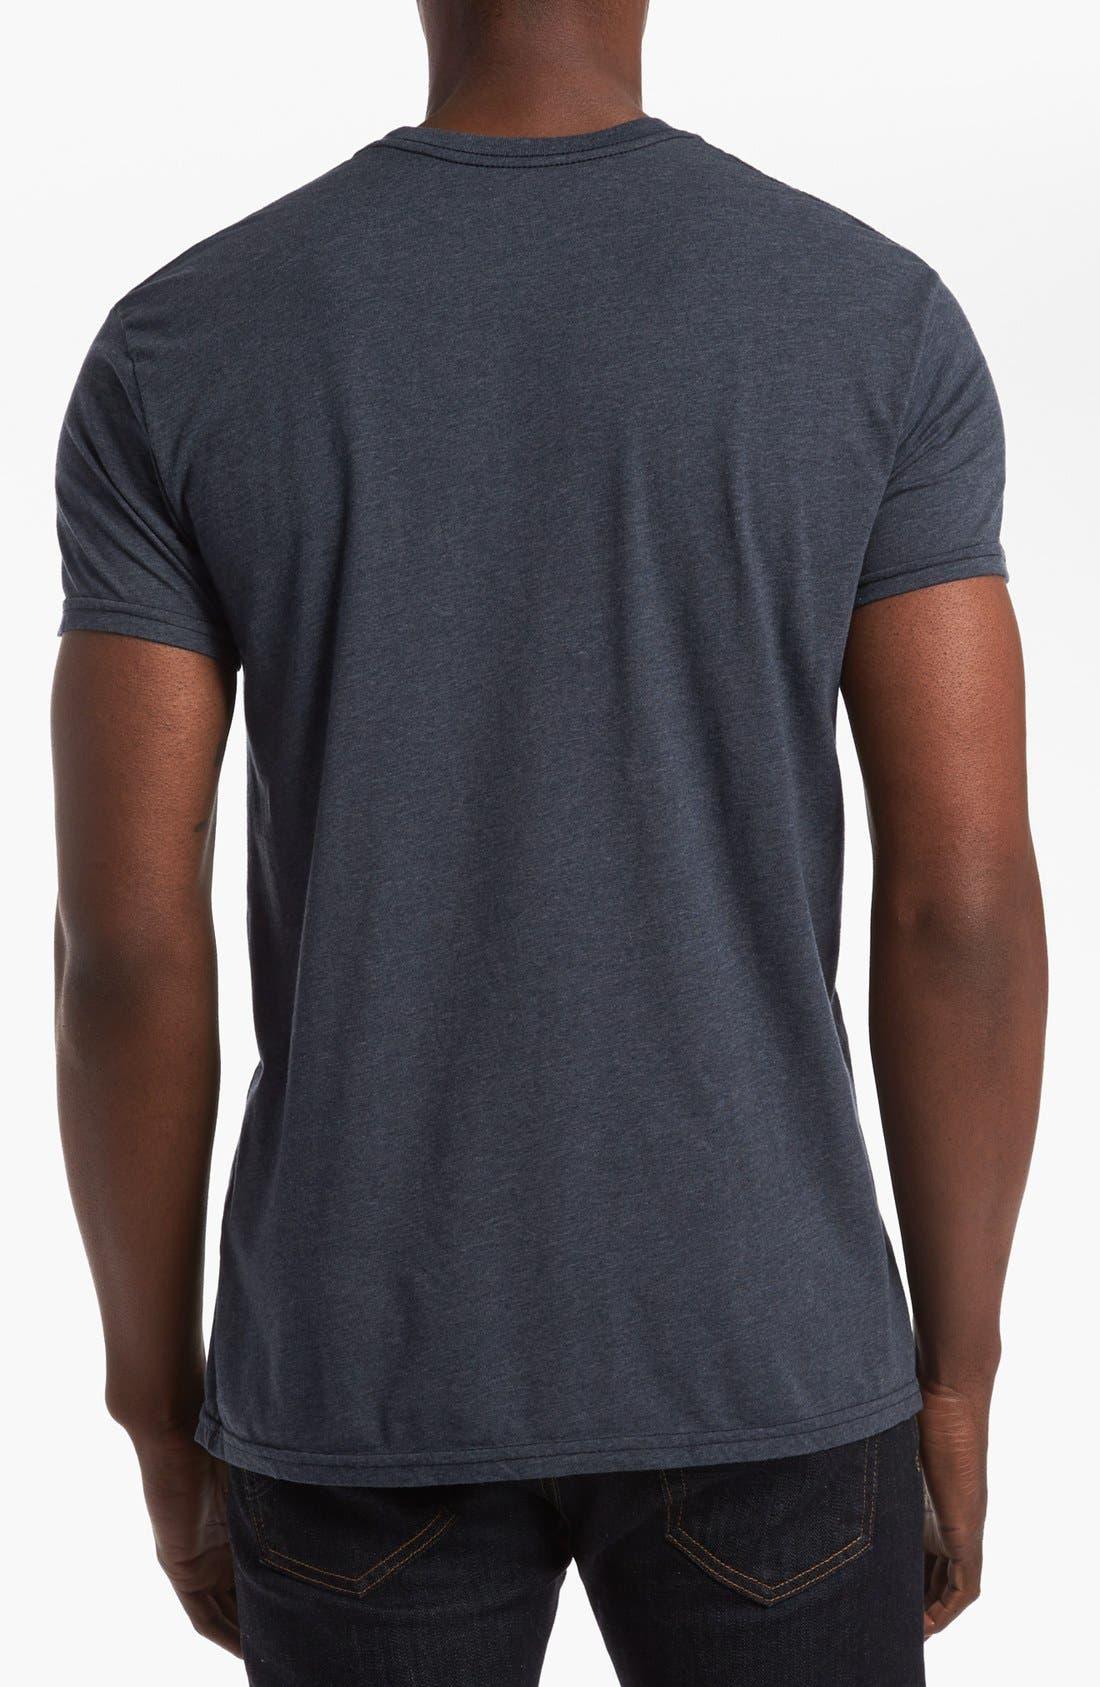 Alternate Image 2  - Retro Brand 'Chevrolet' T-Shirt